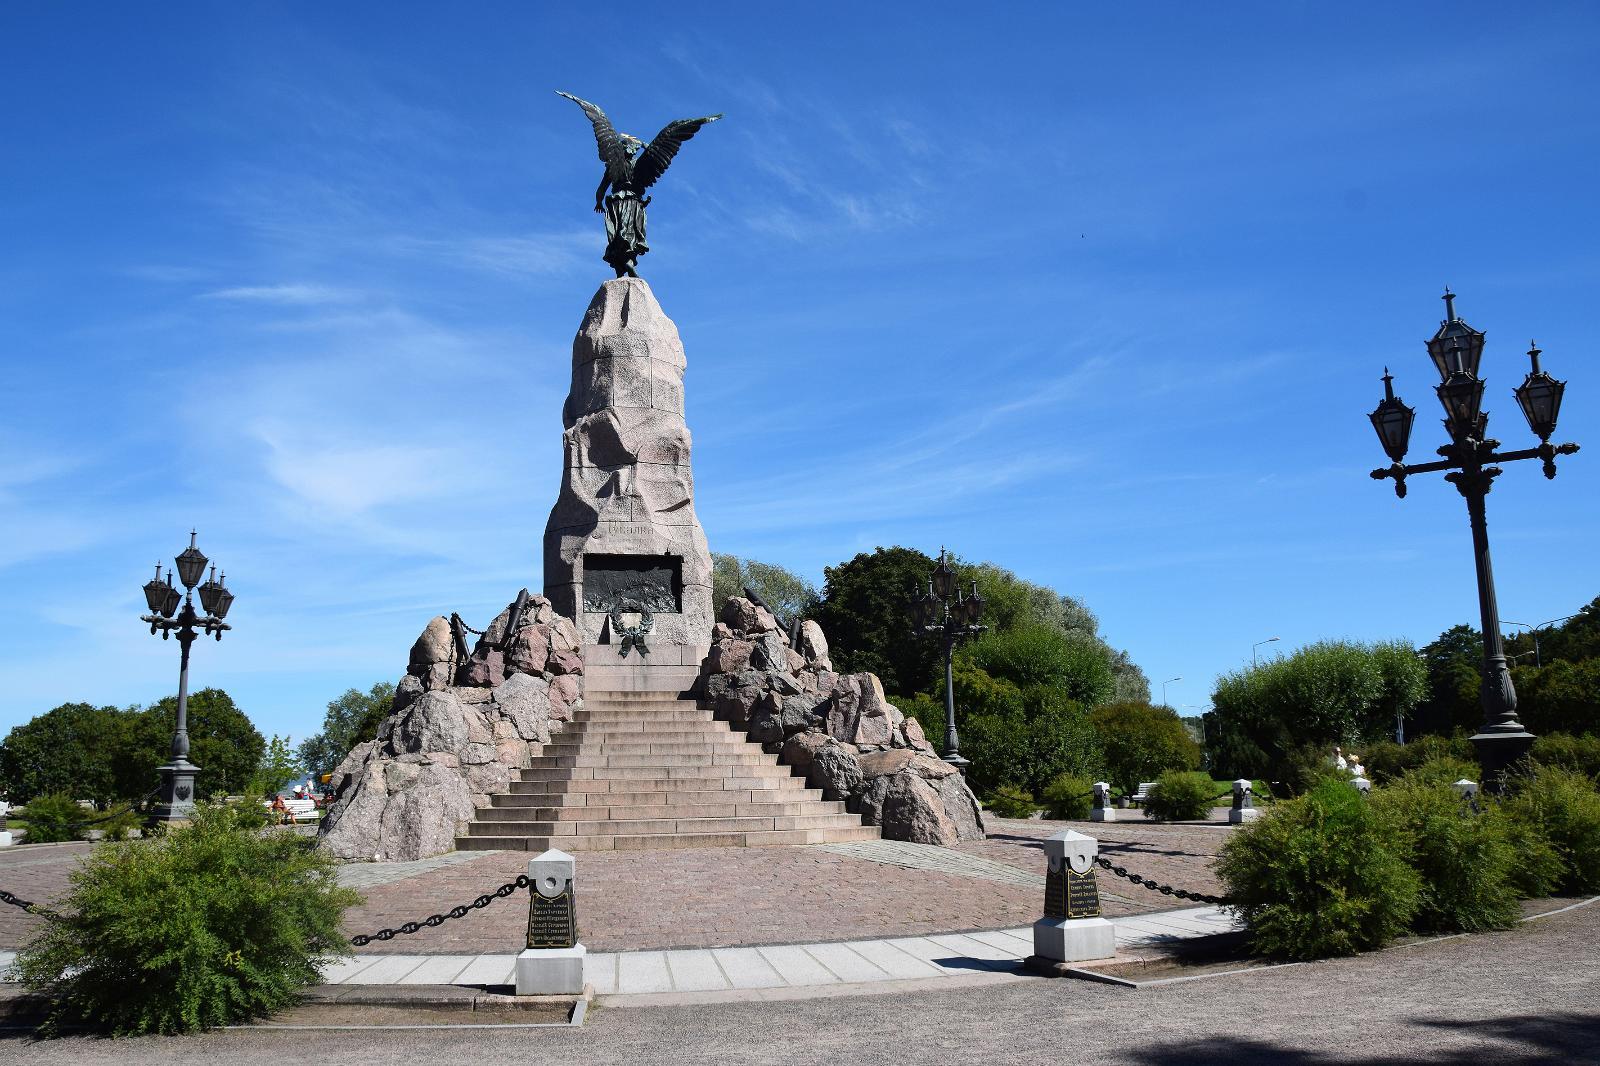 Памятник броненосцу Русалка в Таллине